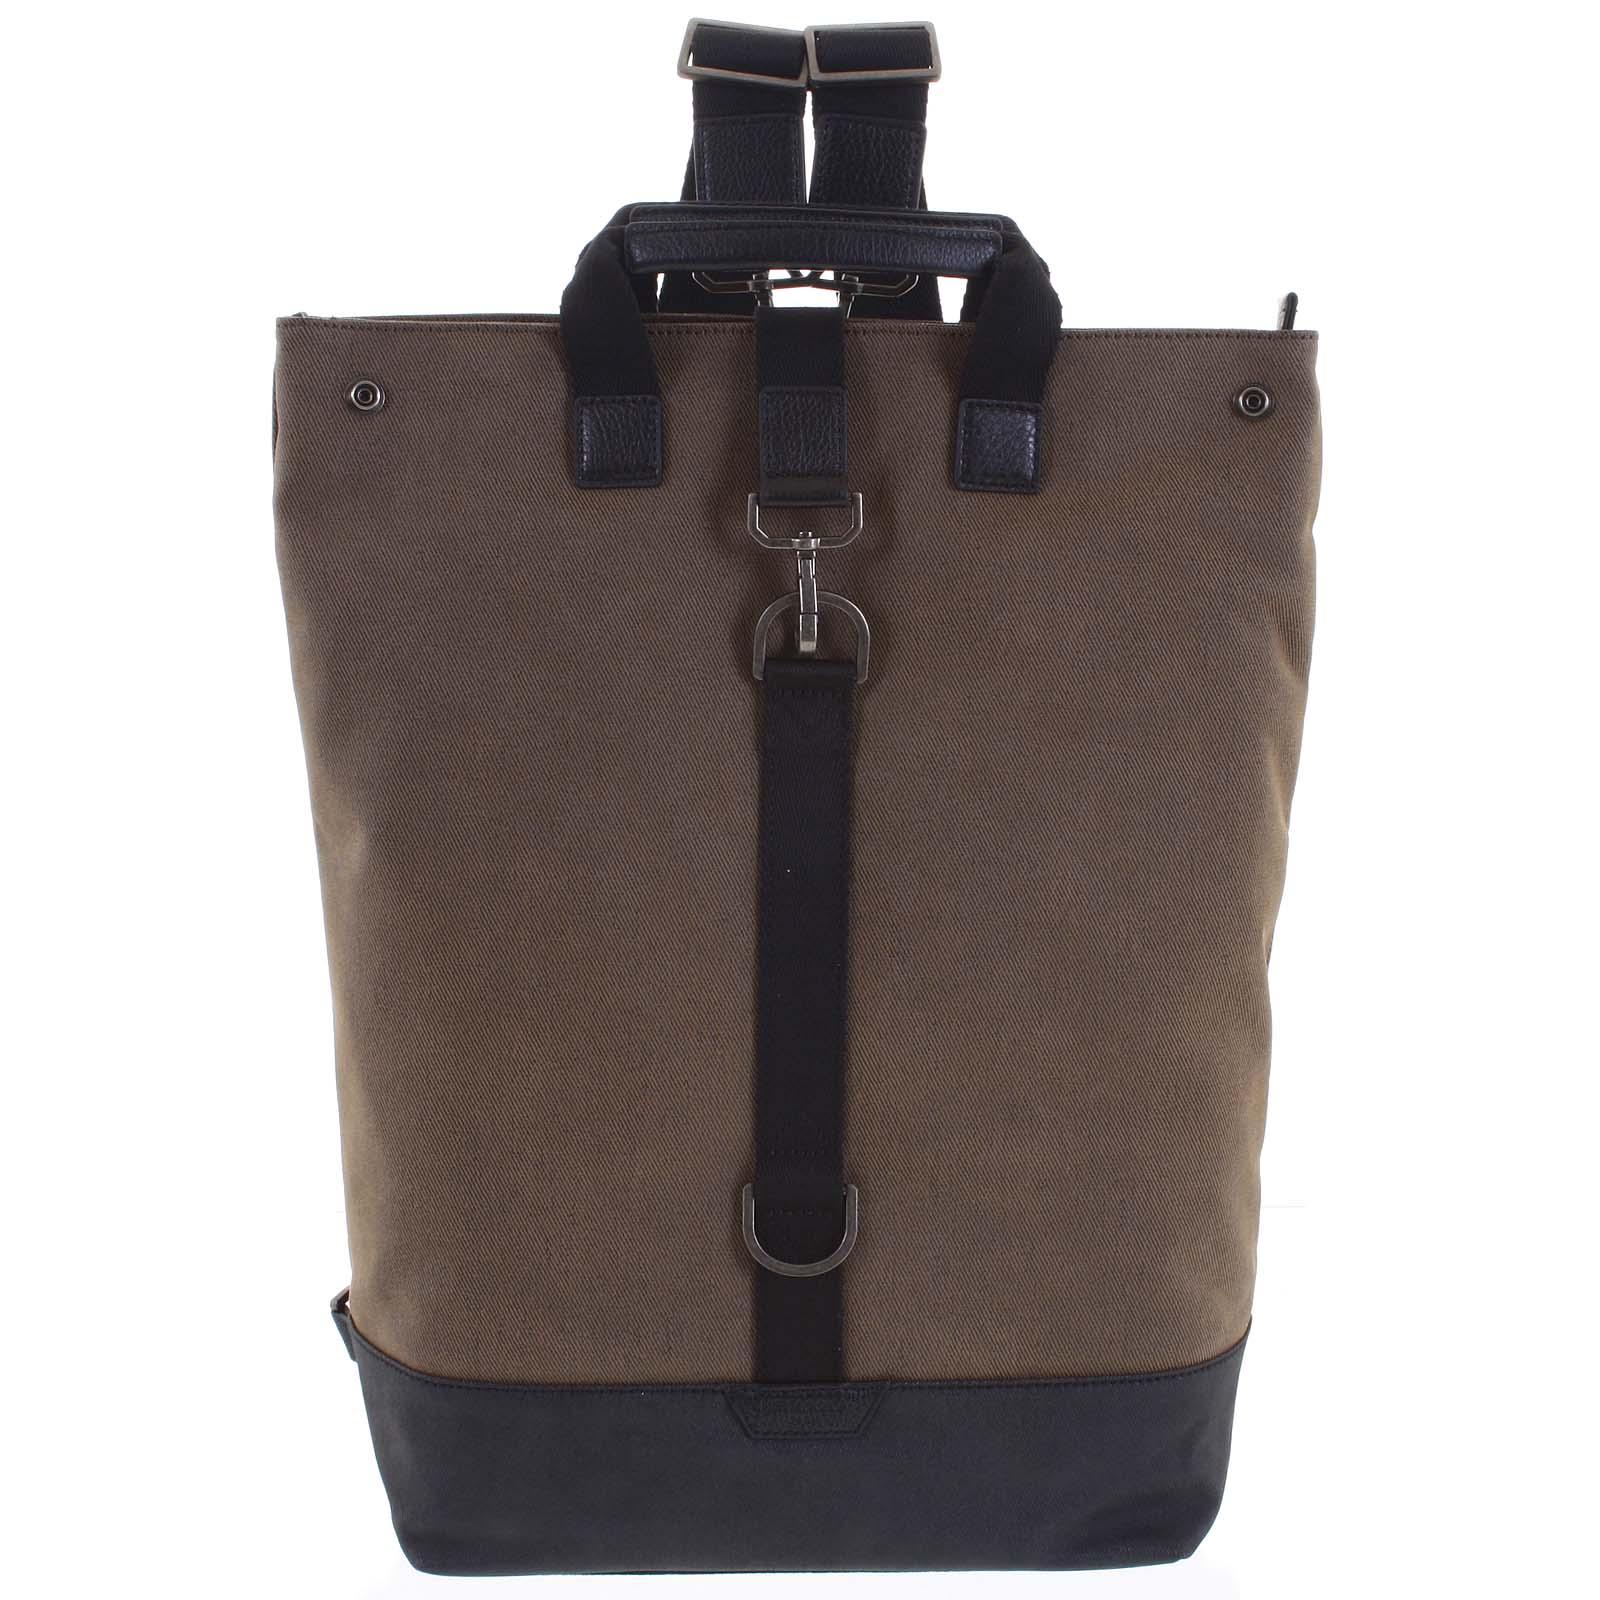 Pánský velký batoh hnědý - Hexagona Adrien